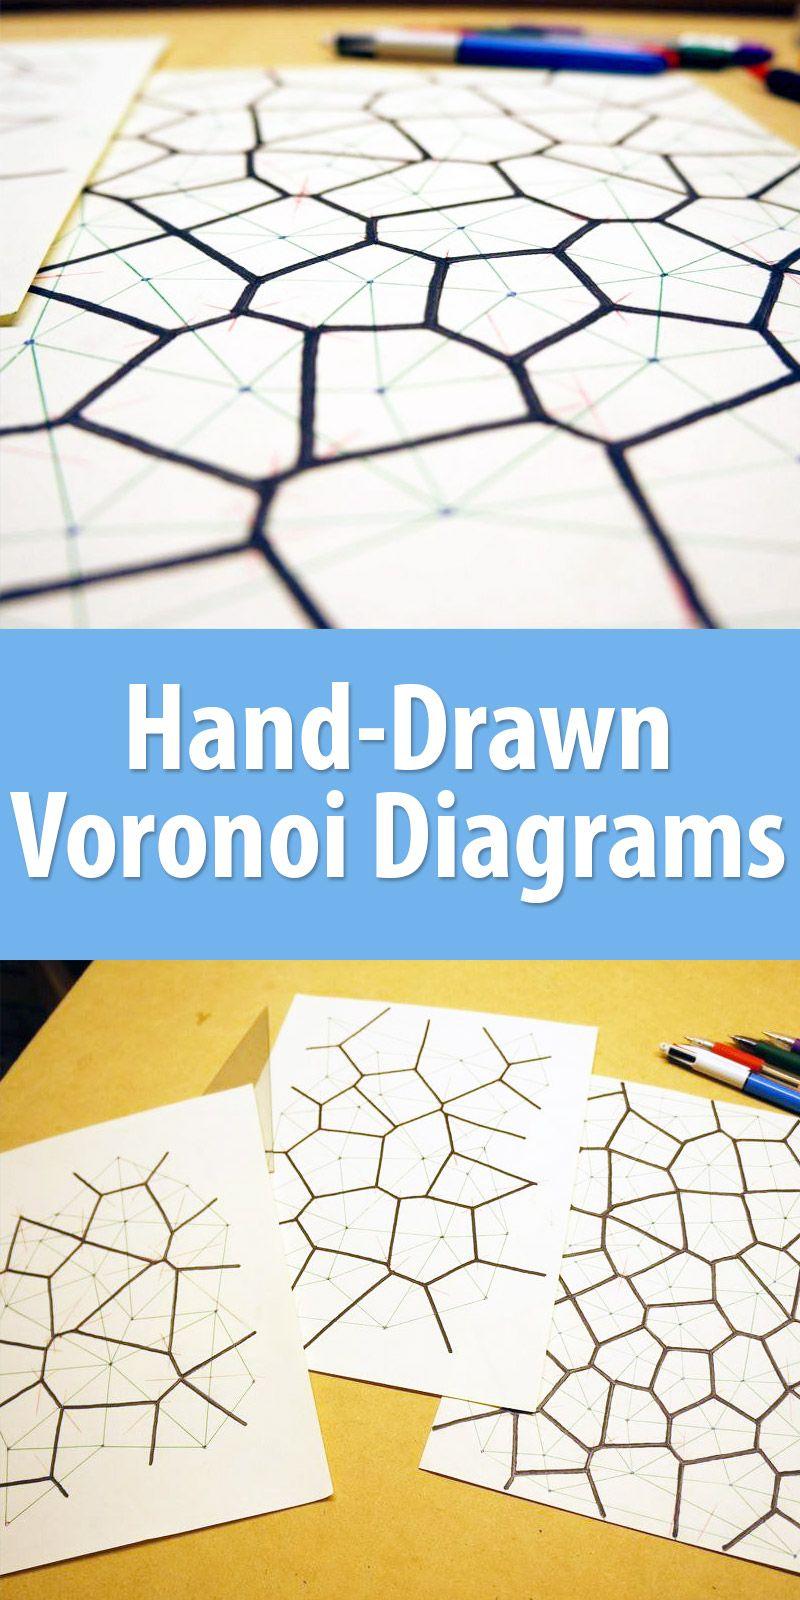 Hand-Drawn Voronoi Diagrams | Sharp pencils, Voronoi diagram and Sketchbooks